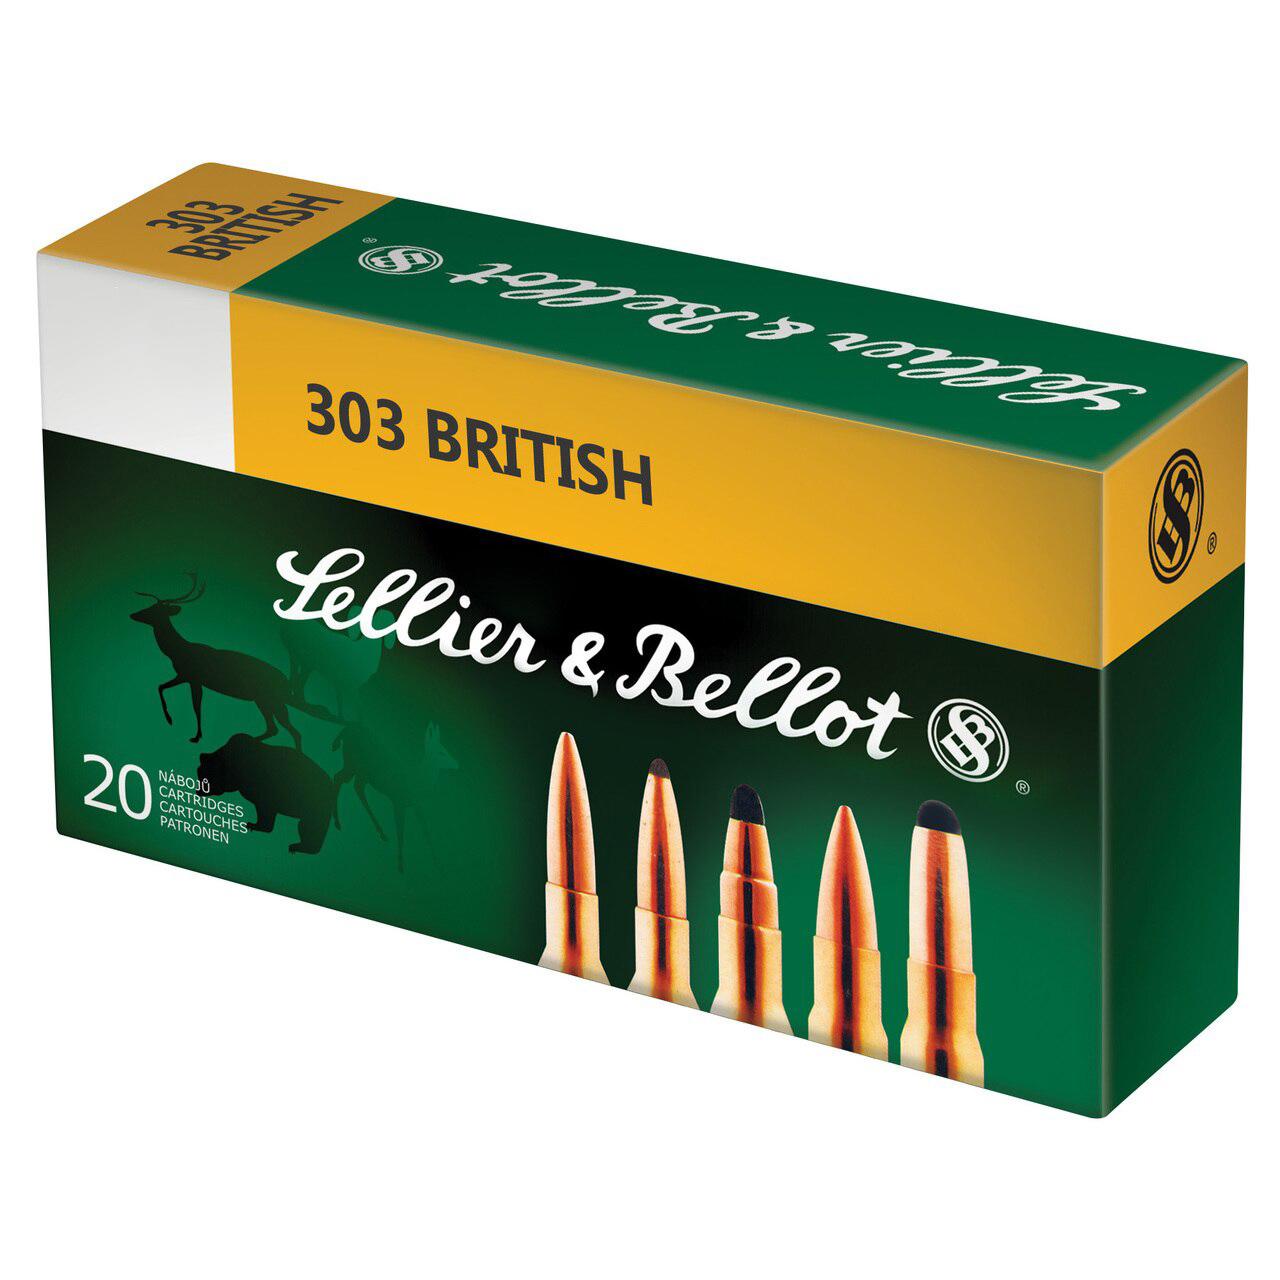 SELLIER & BELLOT 303 British 150 Grain SP Ammo, 20 Round Box (SB303B) -  $12 99